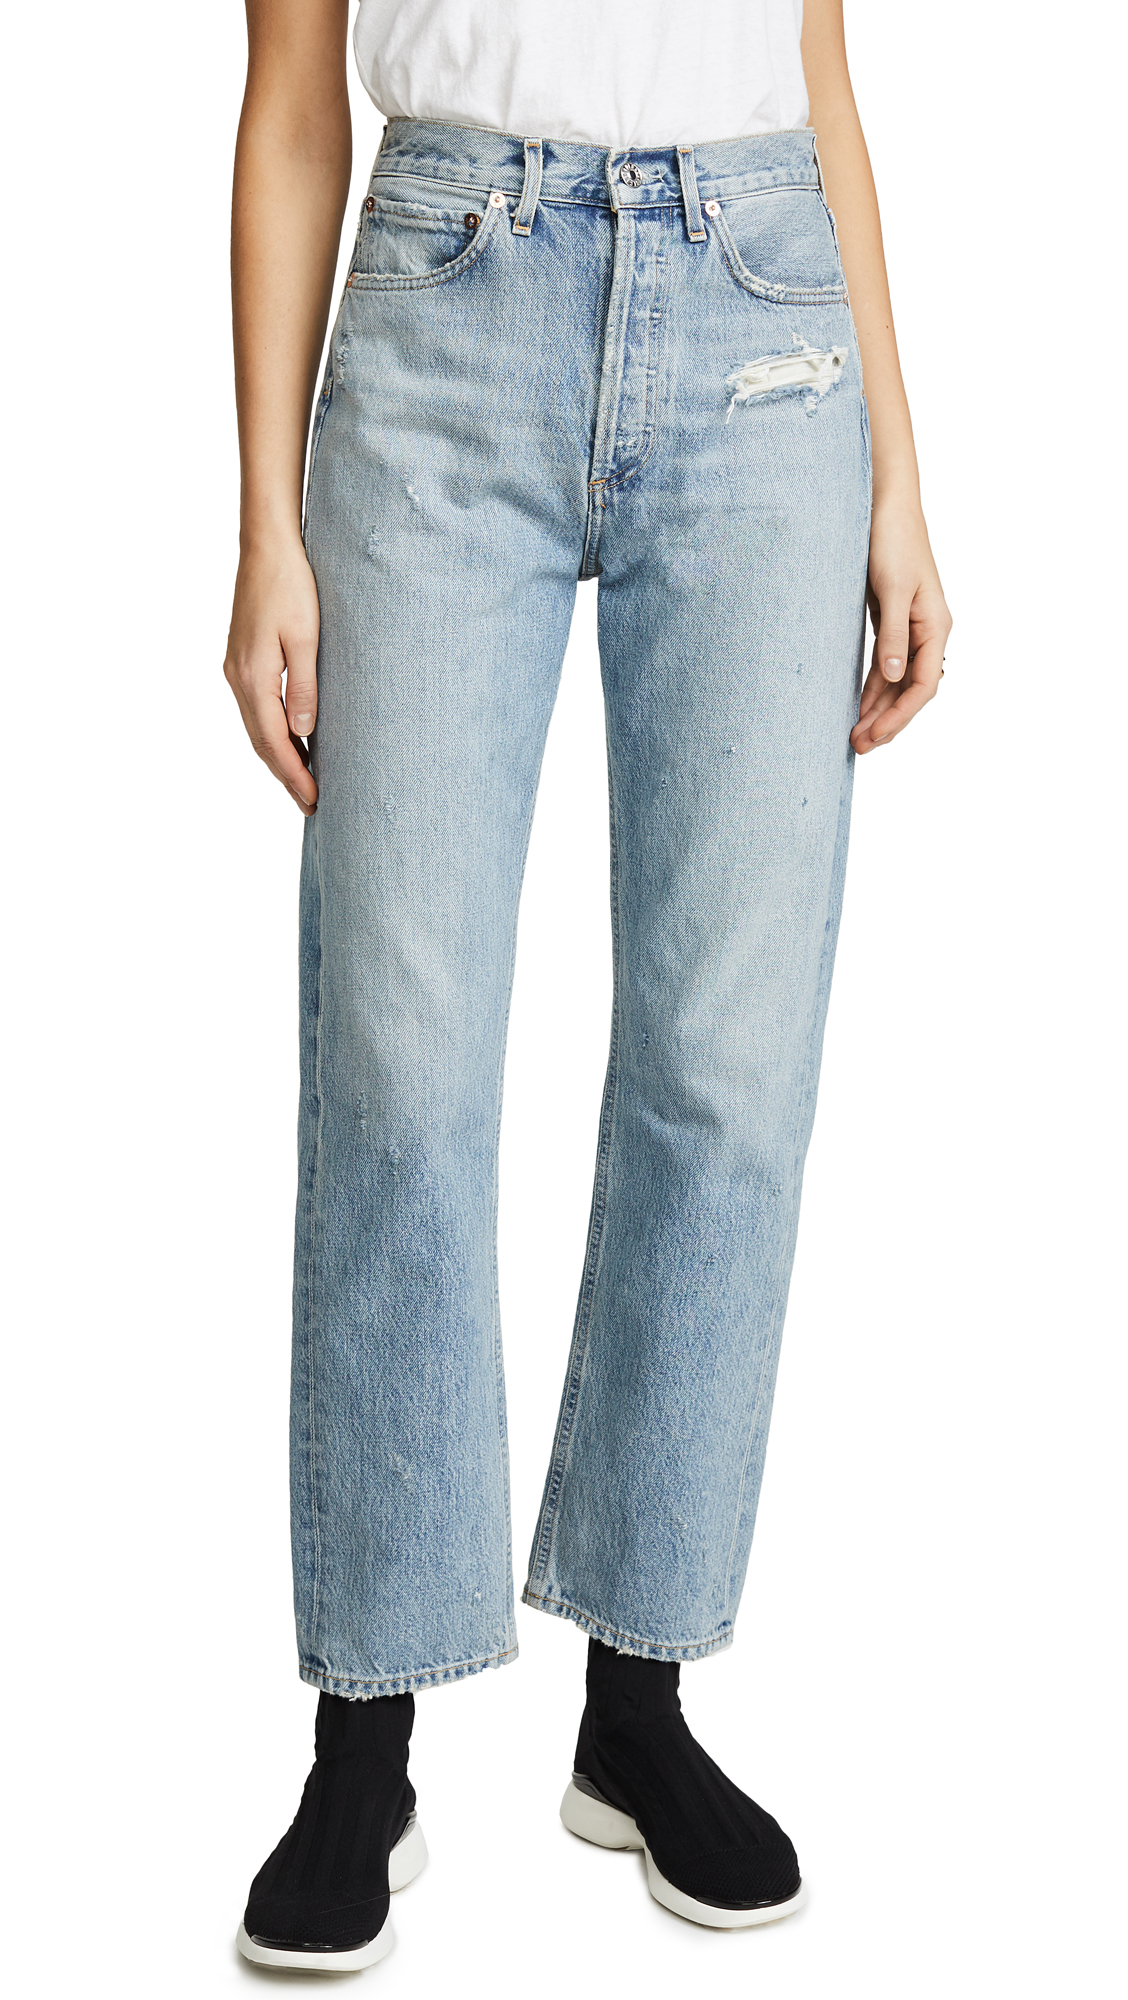 5b2dc41168 AGOLDE 90s Fit Mid Rise Jeans | SHOPBOP